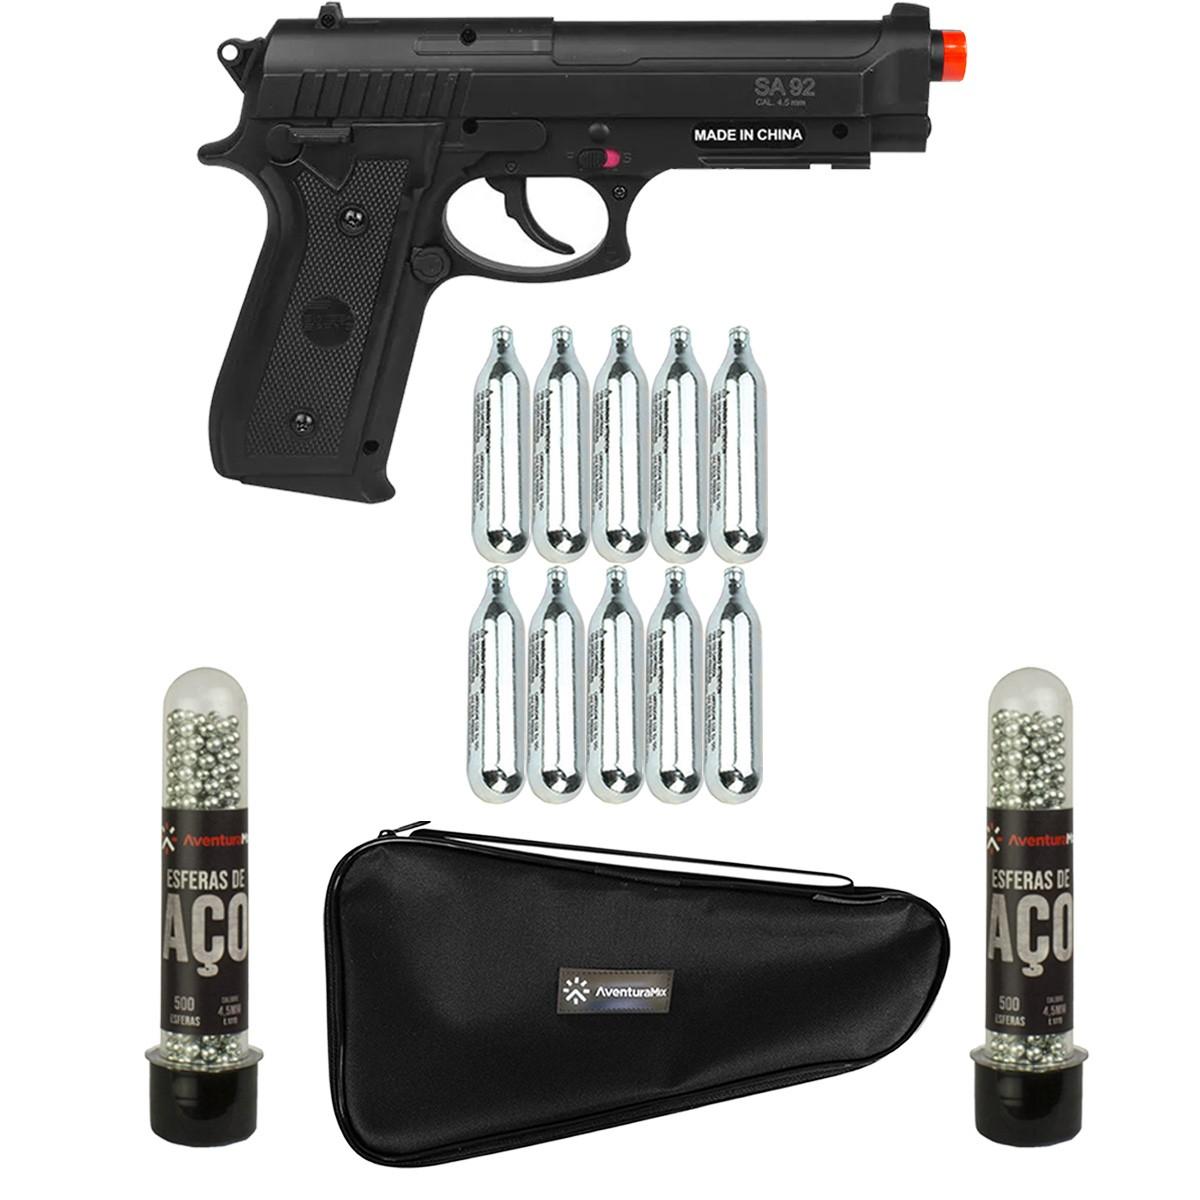 Pistola De Pressão Co2 SA P92 Swiss Arms 4.5mm + 10 Co2 + 1000 Esferas + Capa